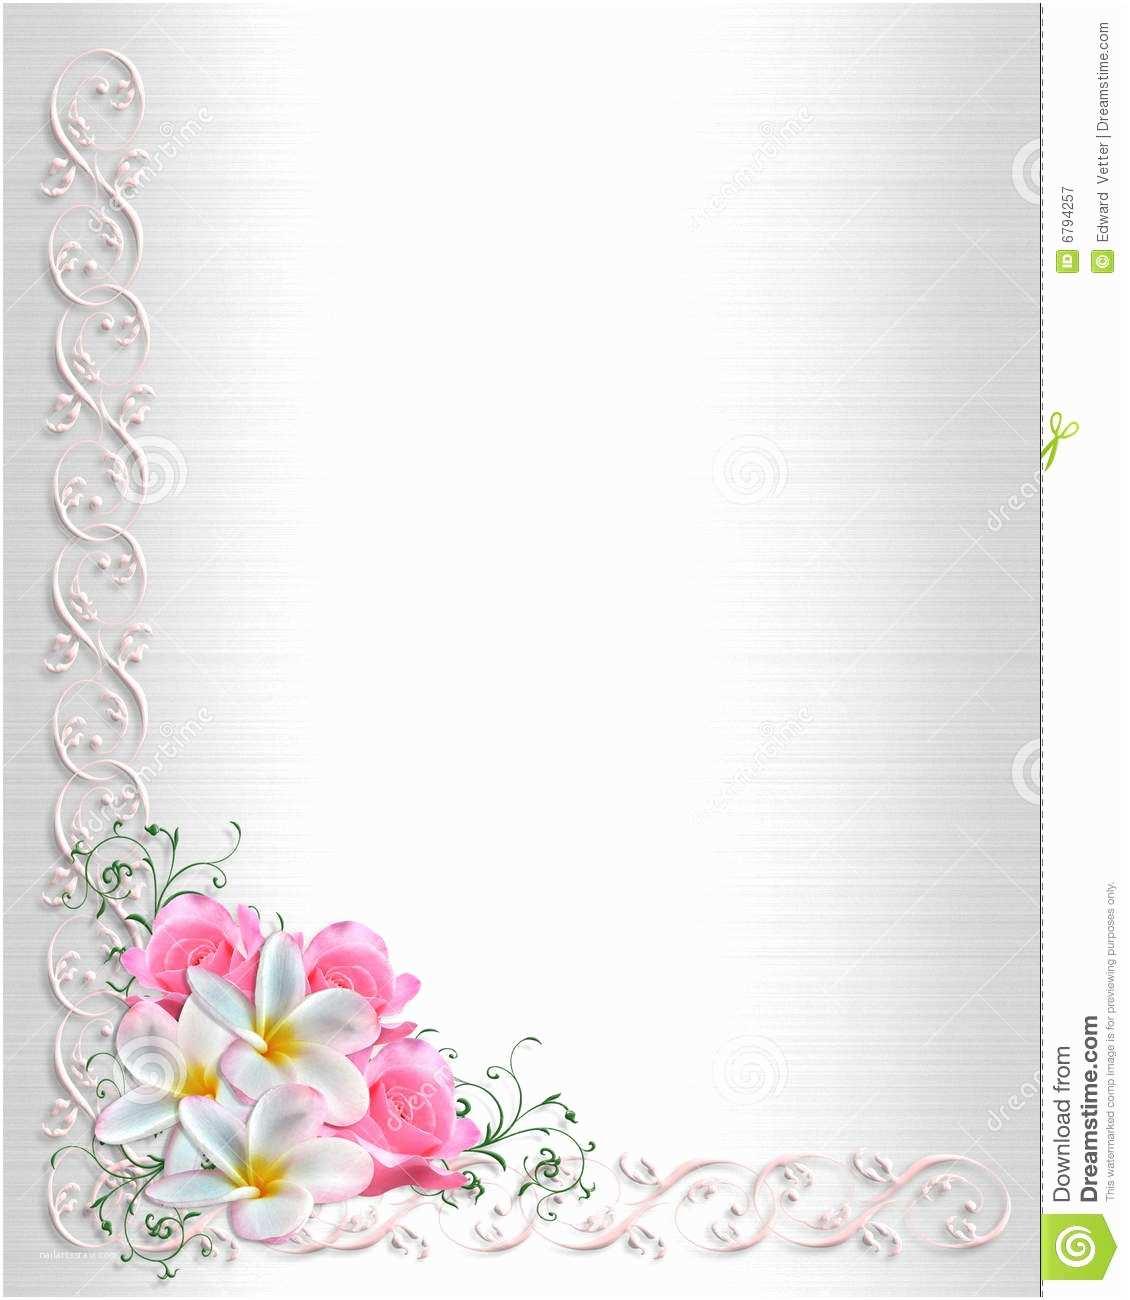 Design Wedding Invitations 14 Wedding Invitation Background Designs Free